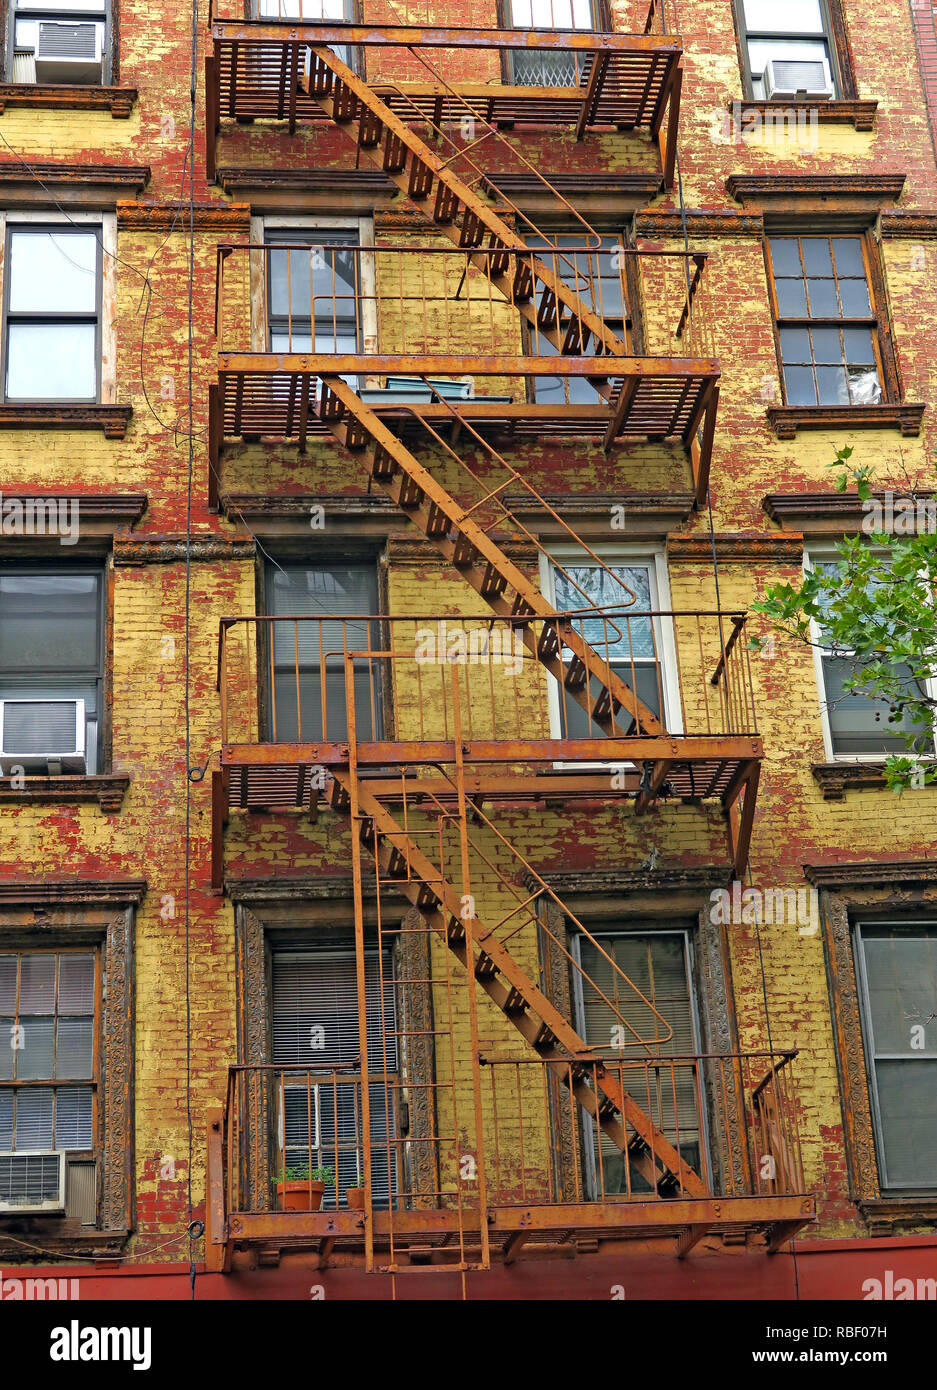 GoTonySmith,@HotpixUK,HotpixUK,NYC,street,New